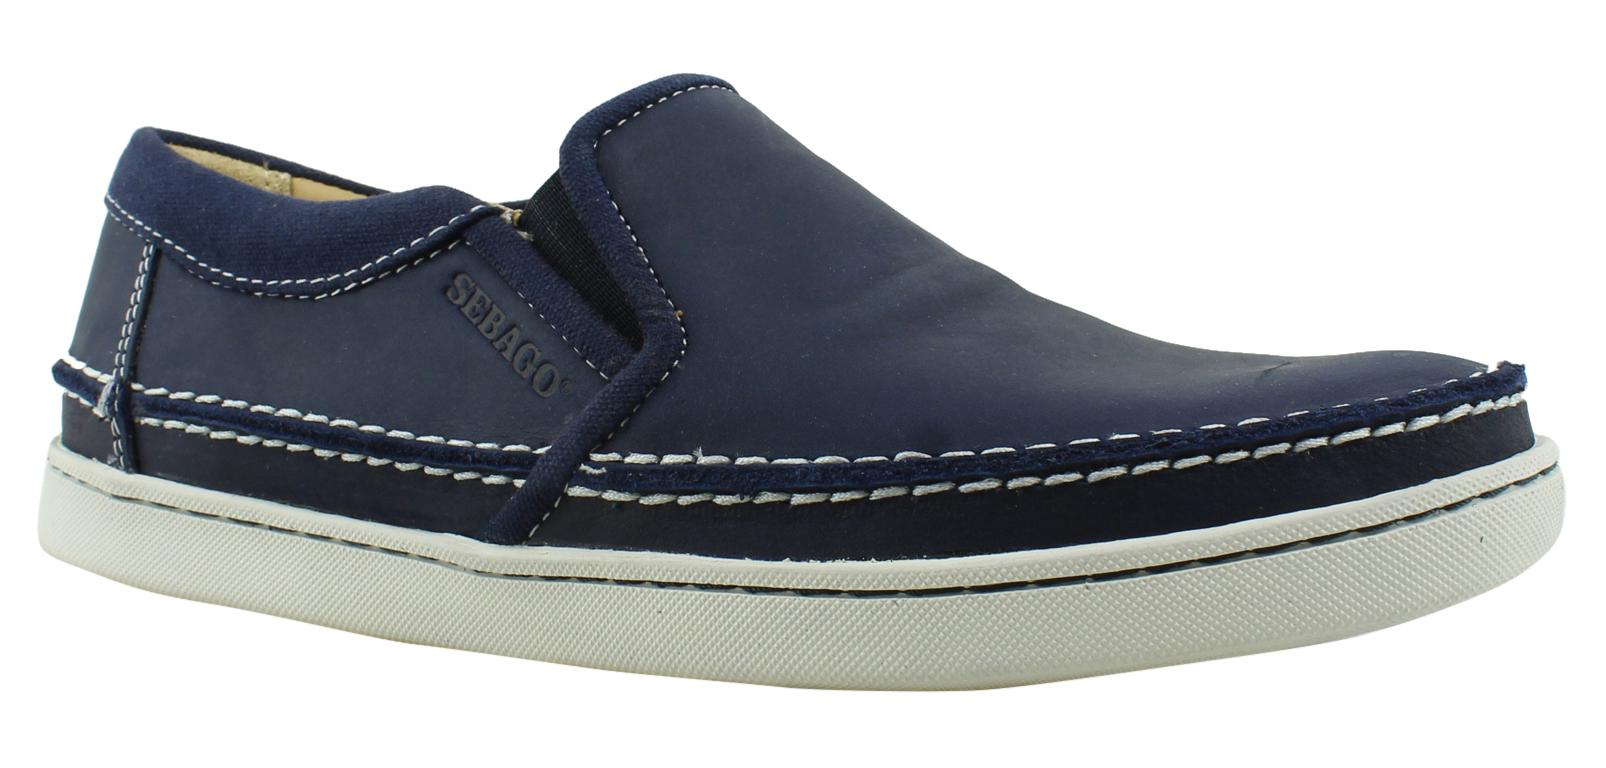 New Sebago Mens Rydeslipon NavyLeather Dress Loafers Size 7 by Sebago